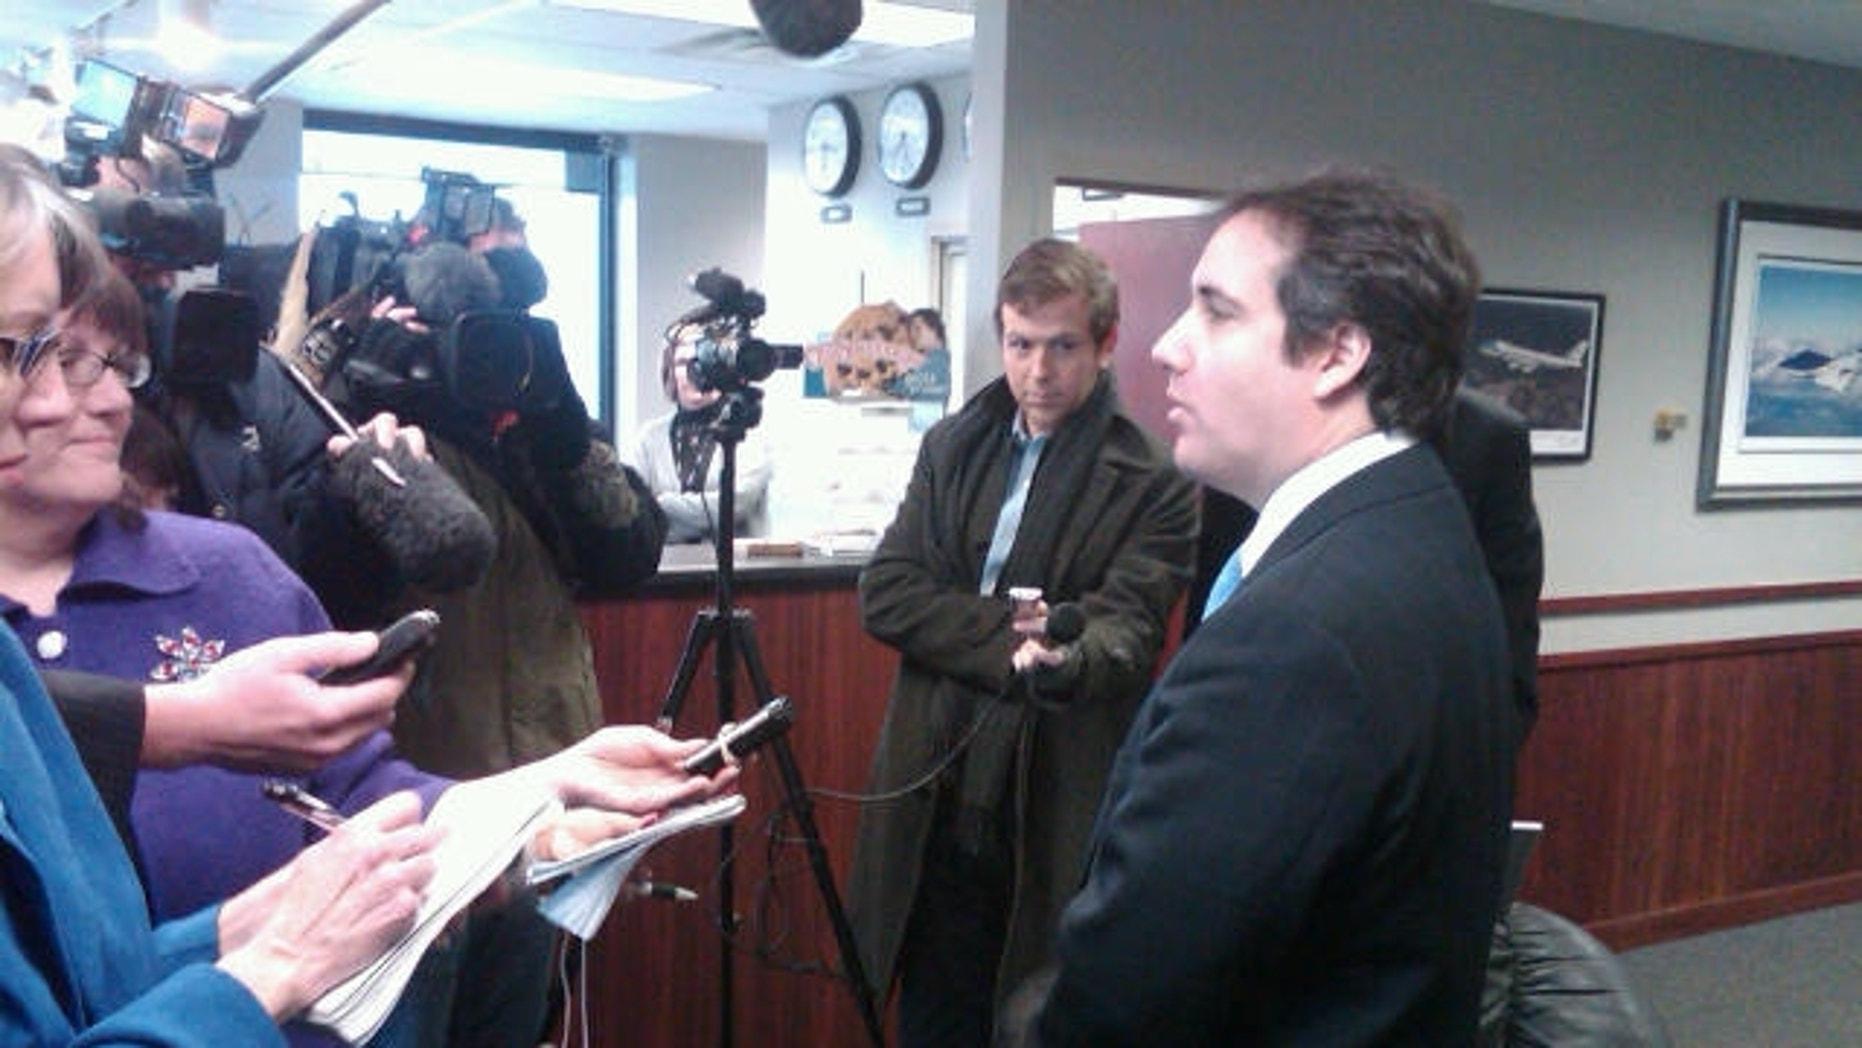 Michael Cohen talks to reporters in Des Moines, Iowa Monday, March 7, 2011 (Fox News Photo)